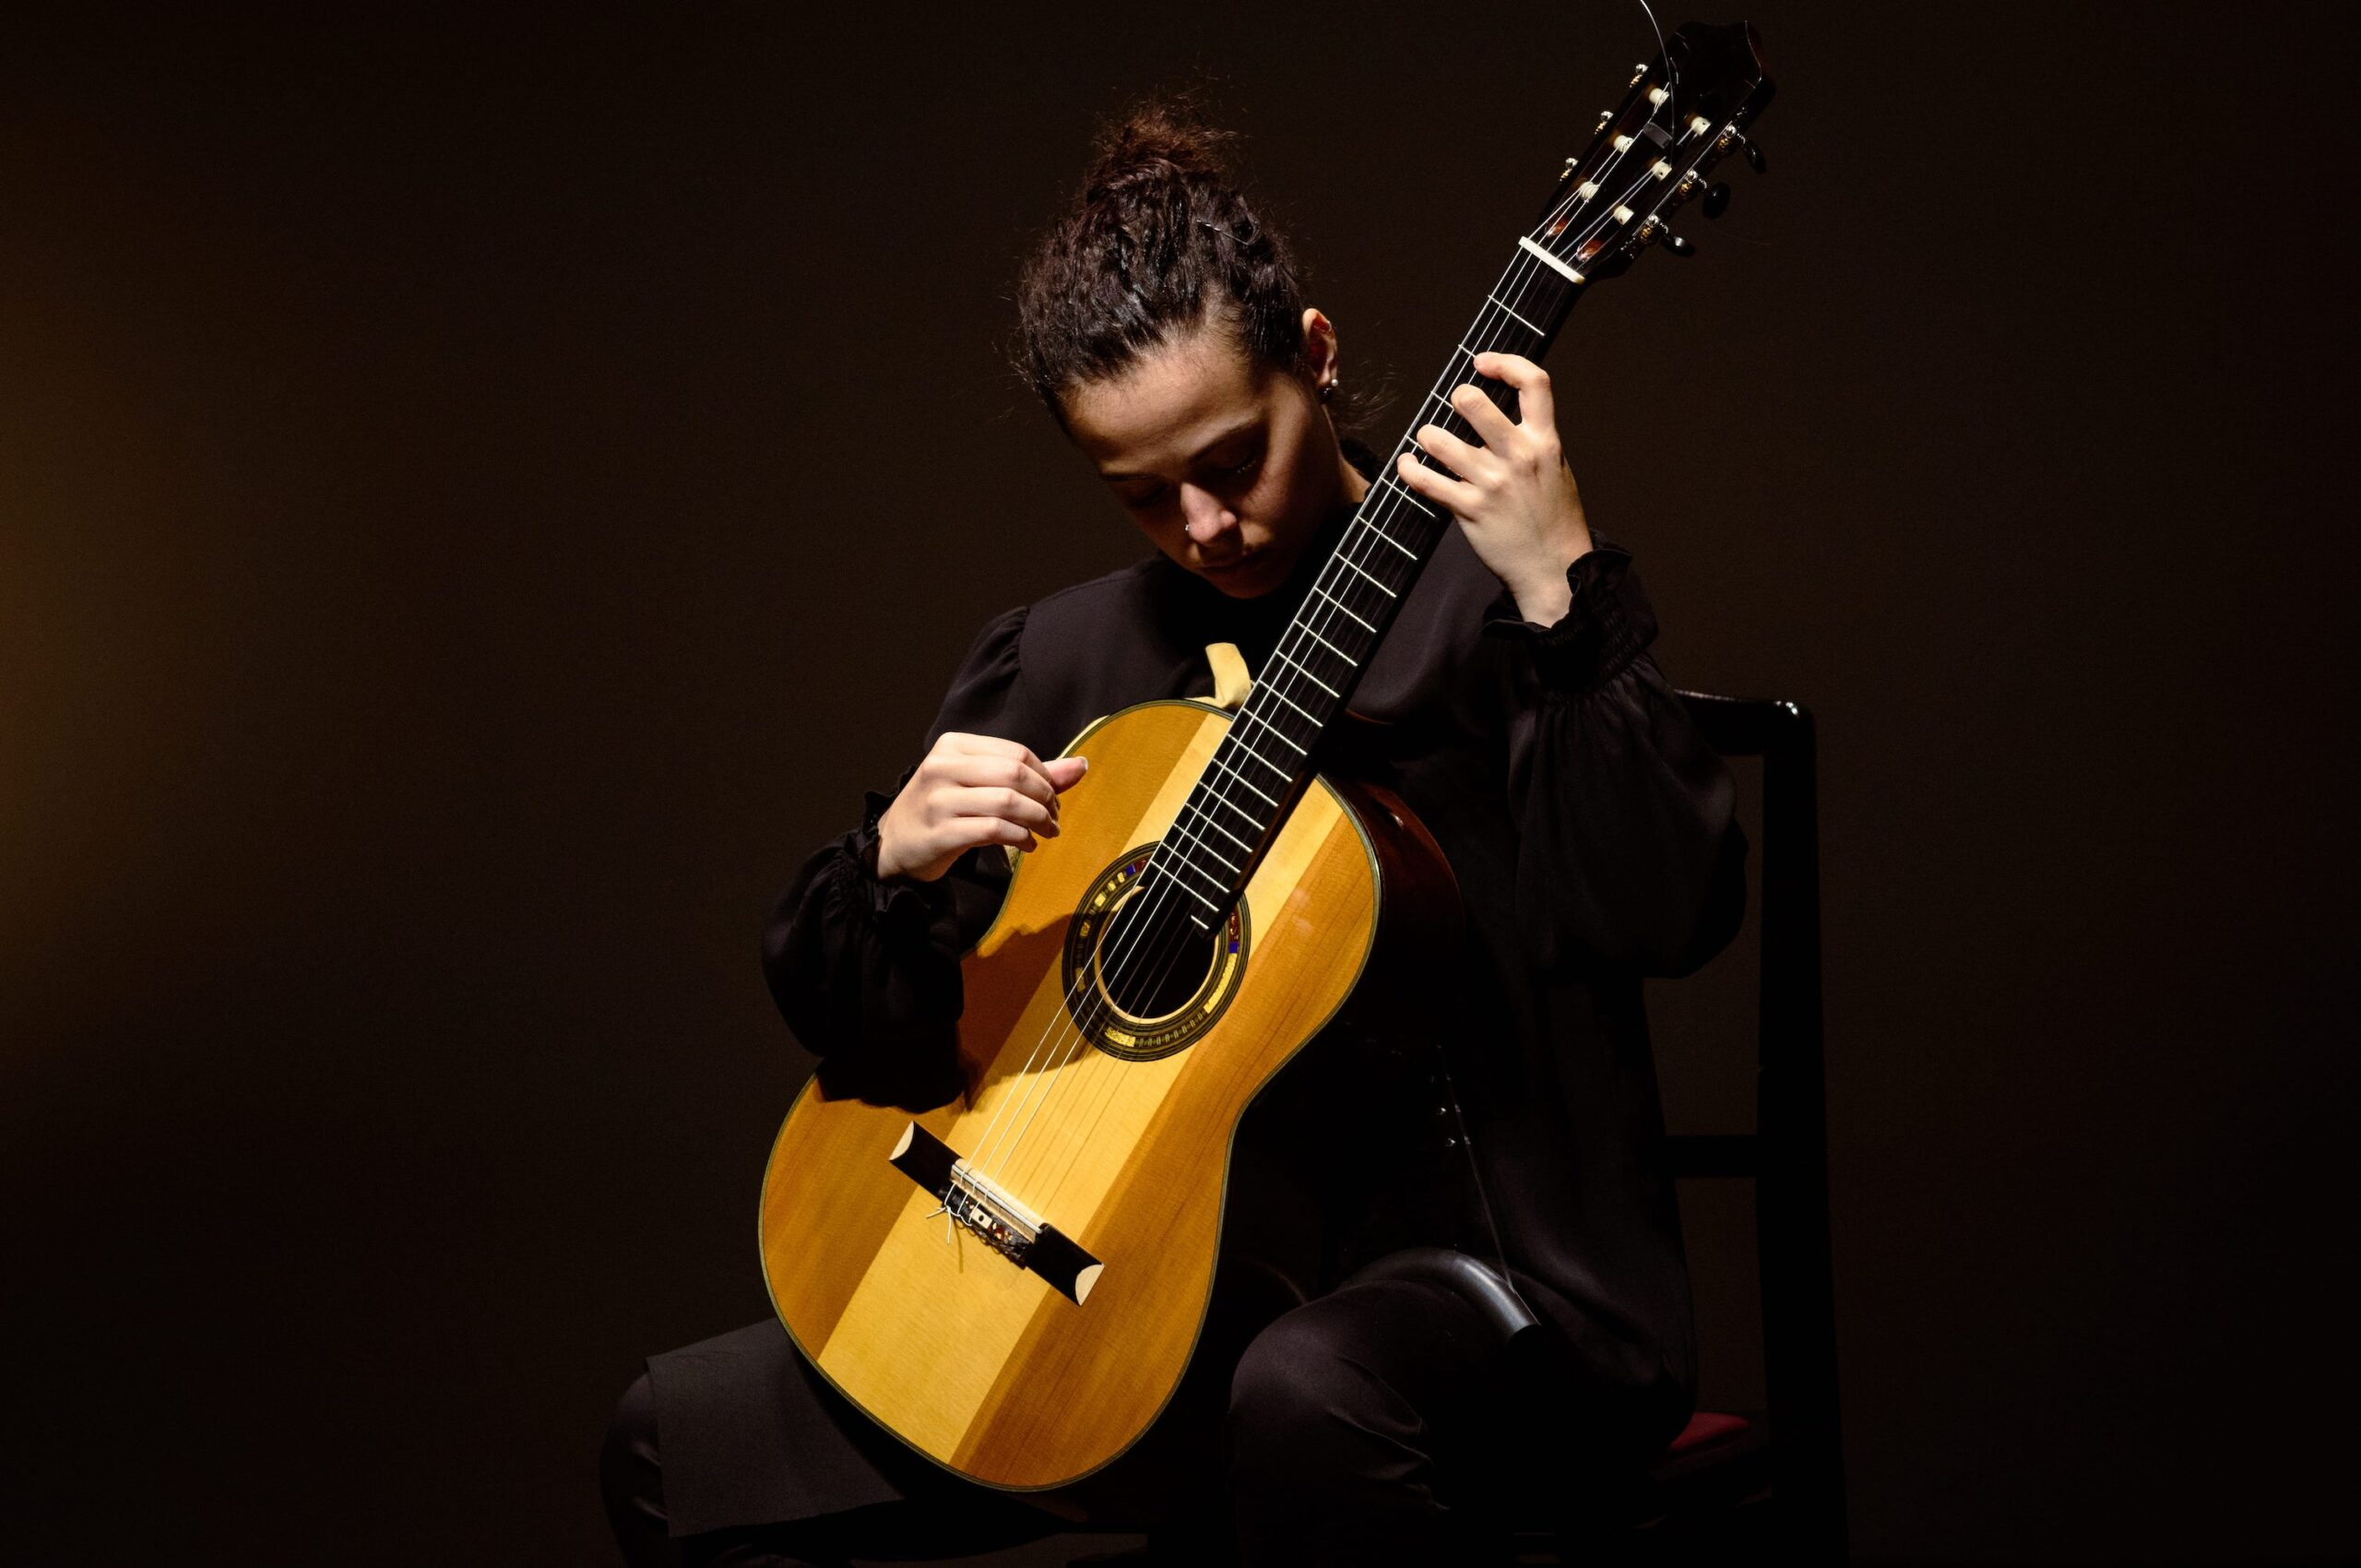 chitarrista-classica-londra-renata-arlotti